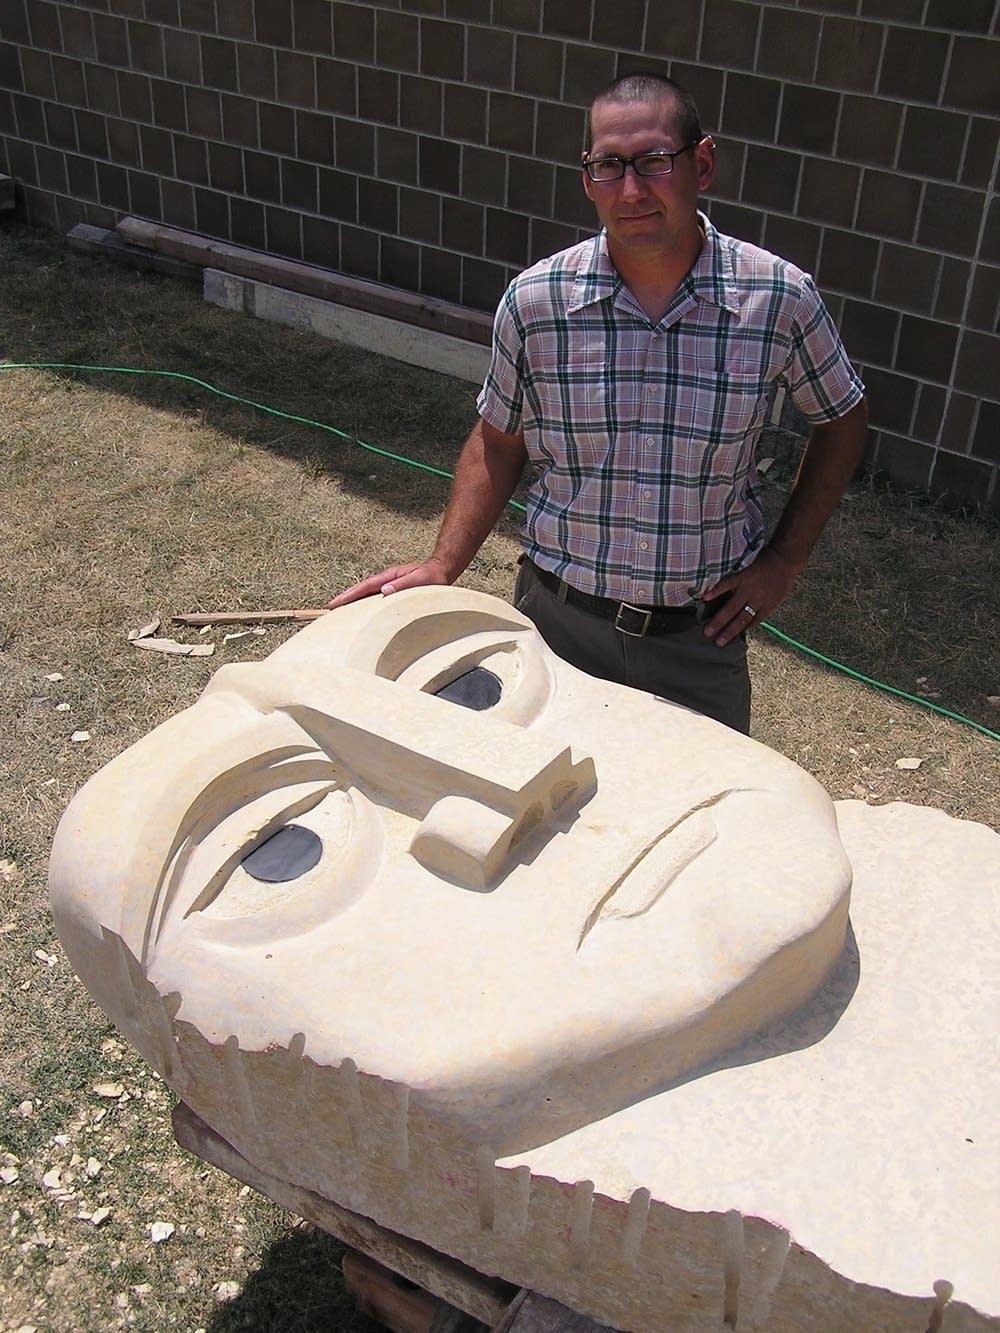 David's Sculpture